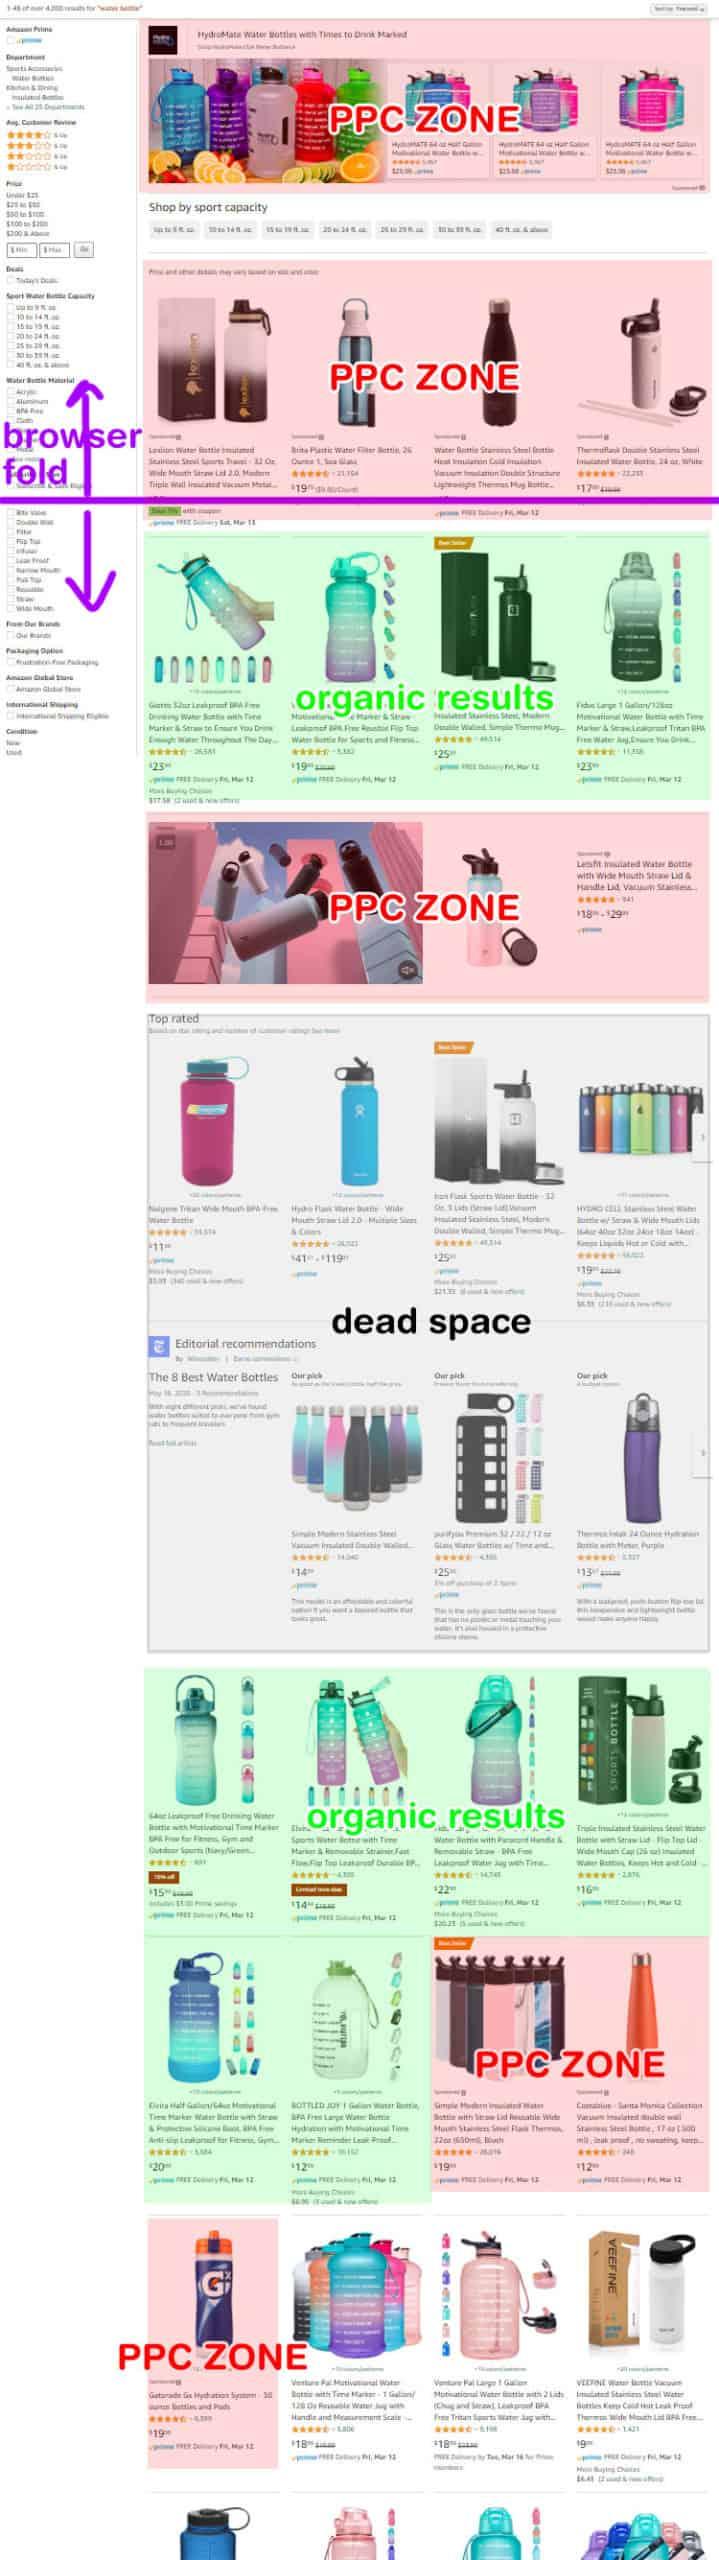 amazon ppc listings display